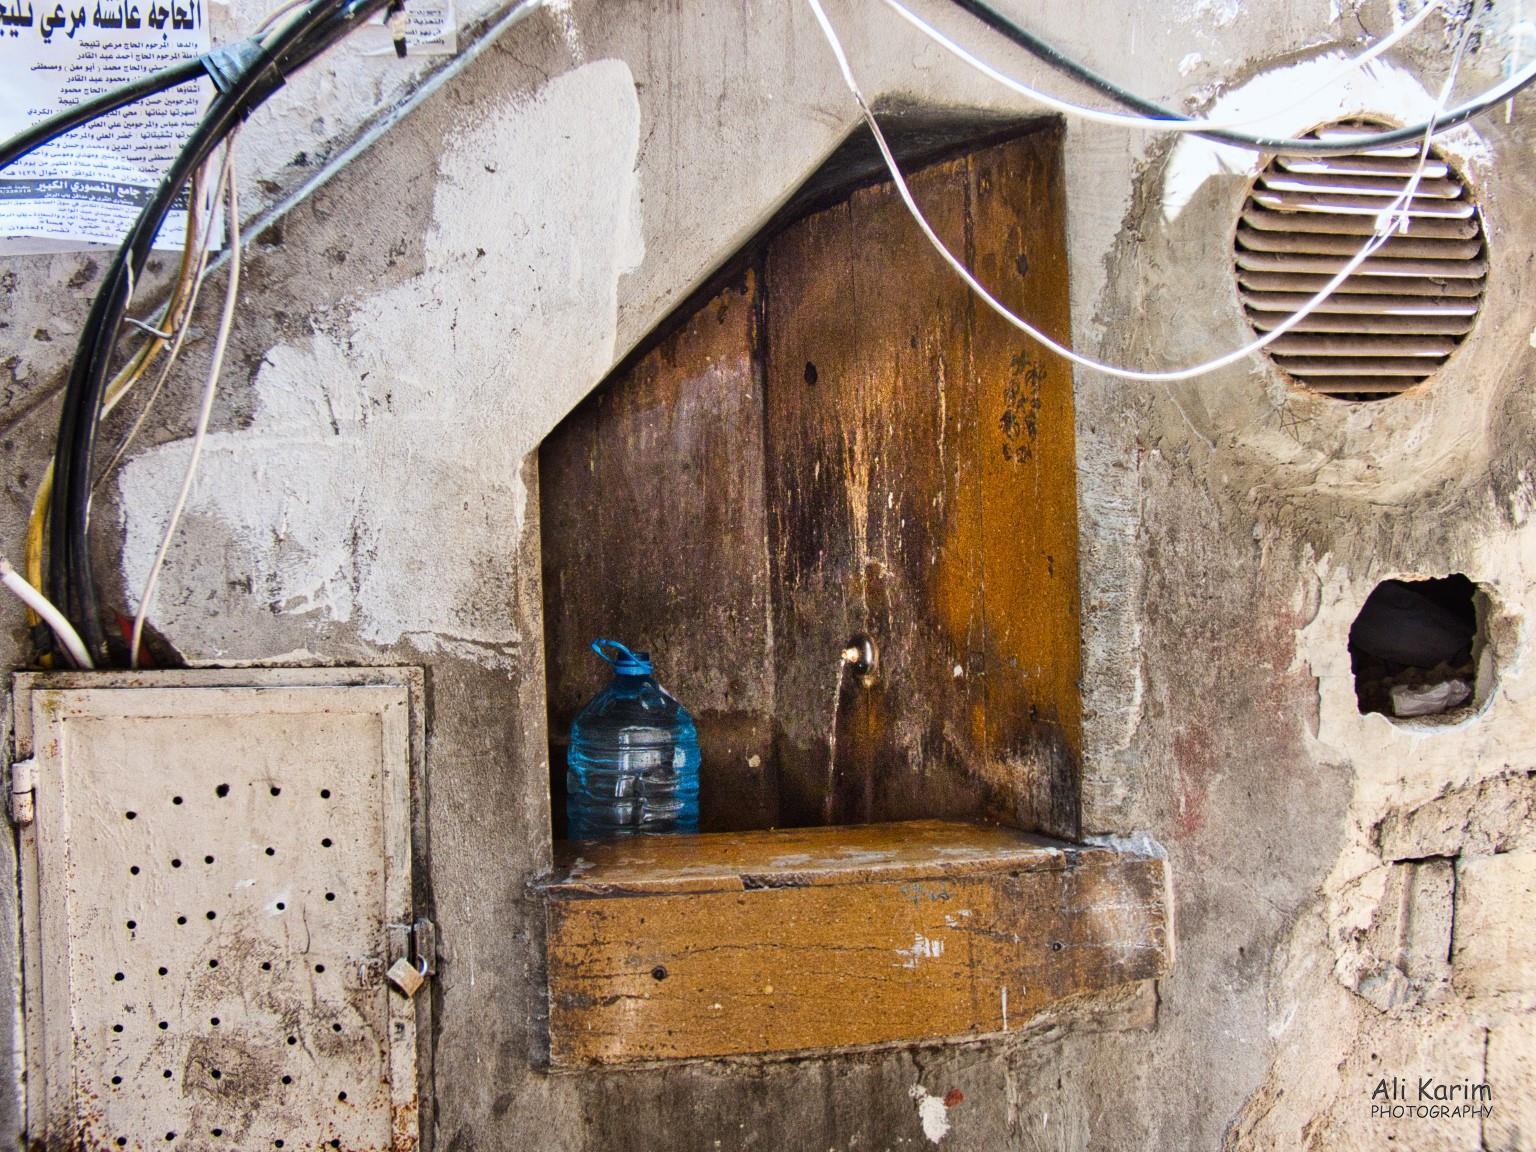 Tripoli Lebanon Local watering hole